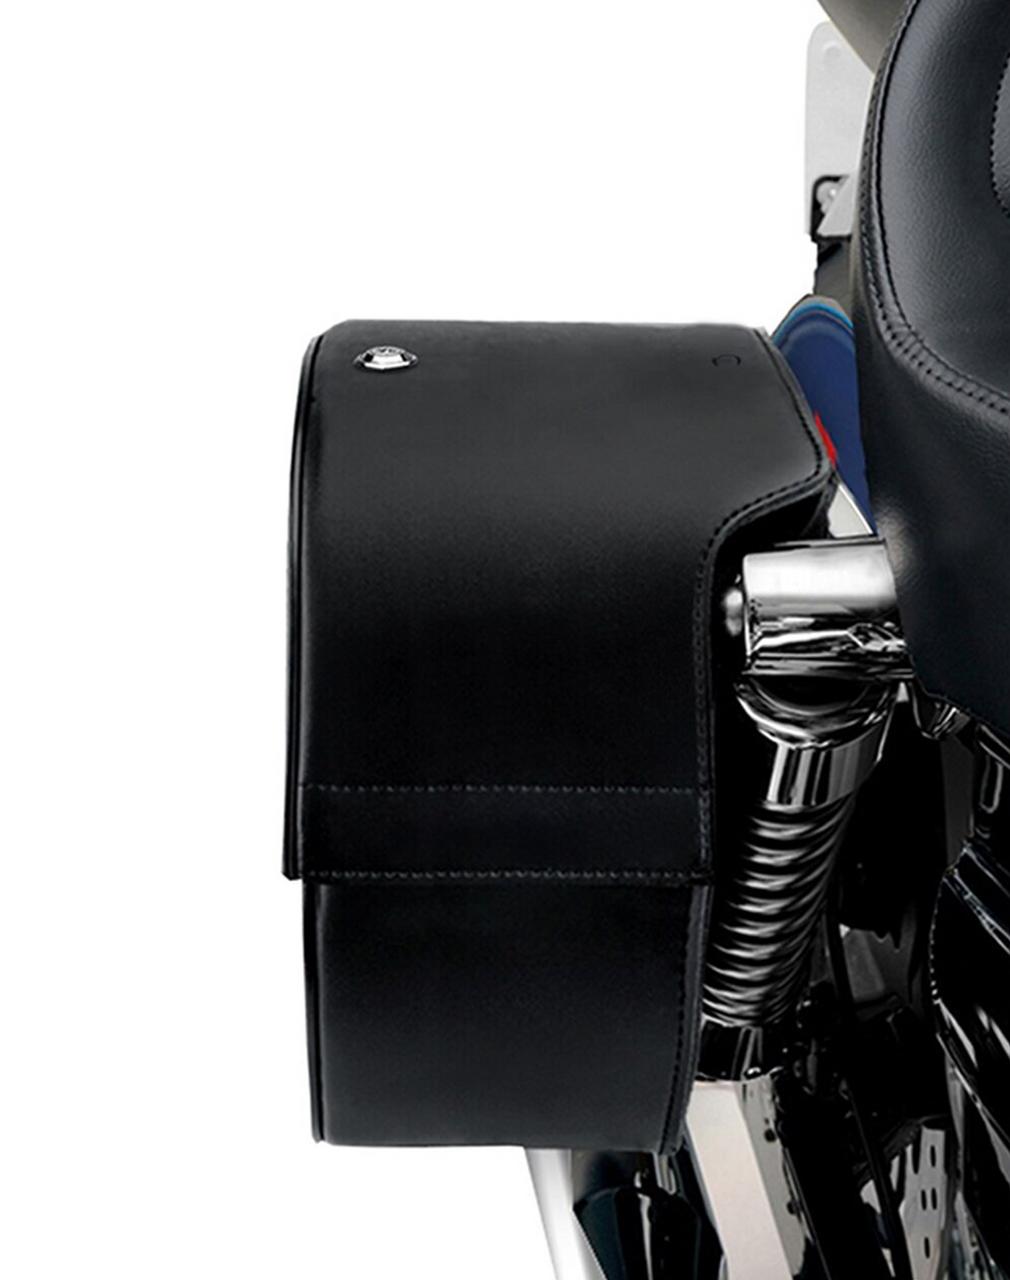 Viking Warrior Shock Cut Slant Large Motorcycle Saddlebags For Harley Dyna Street Bob FXDB shock cutout view